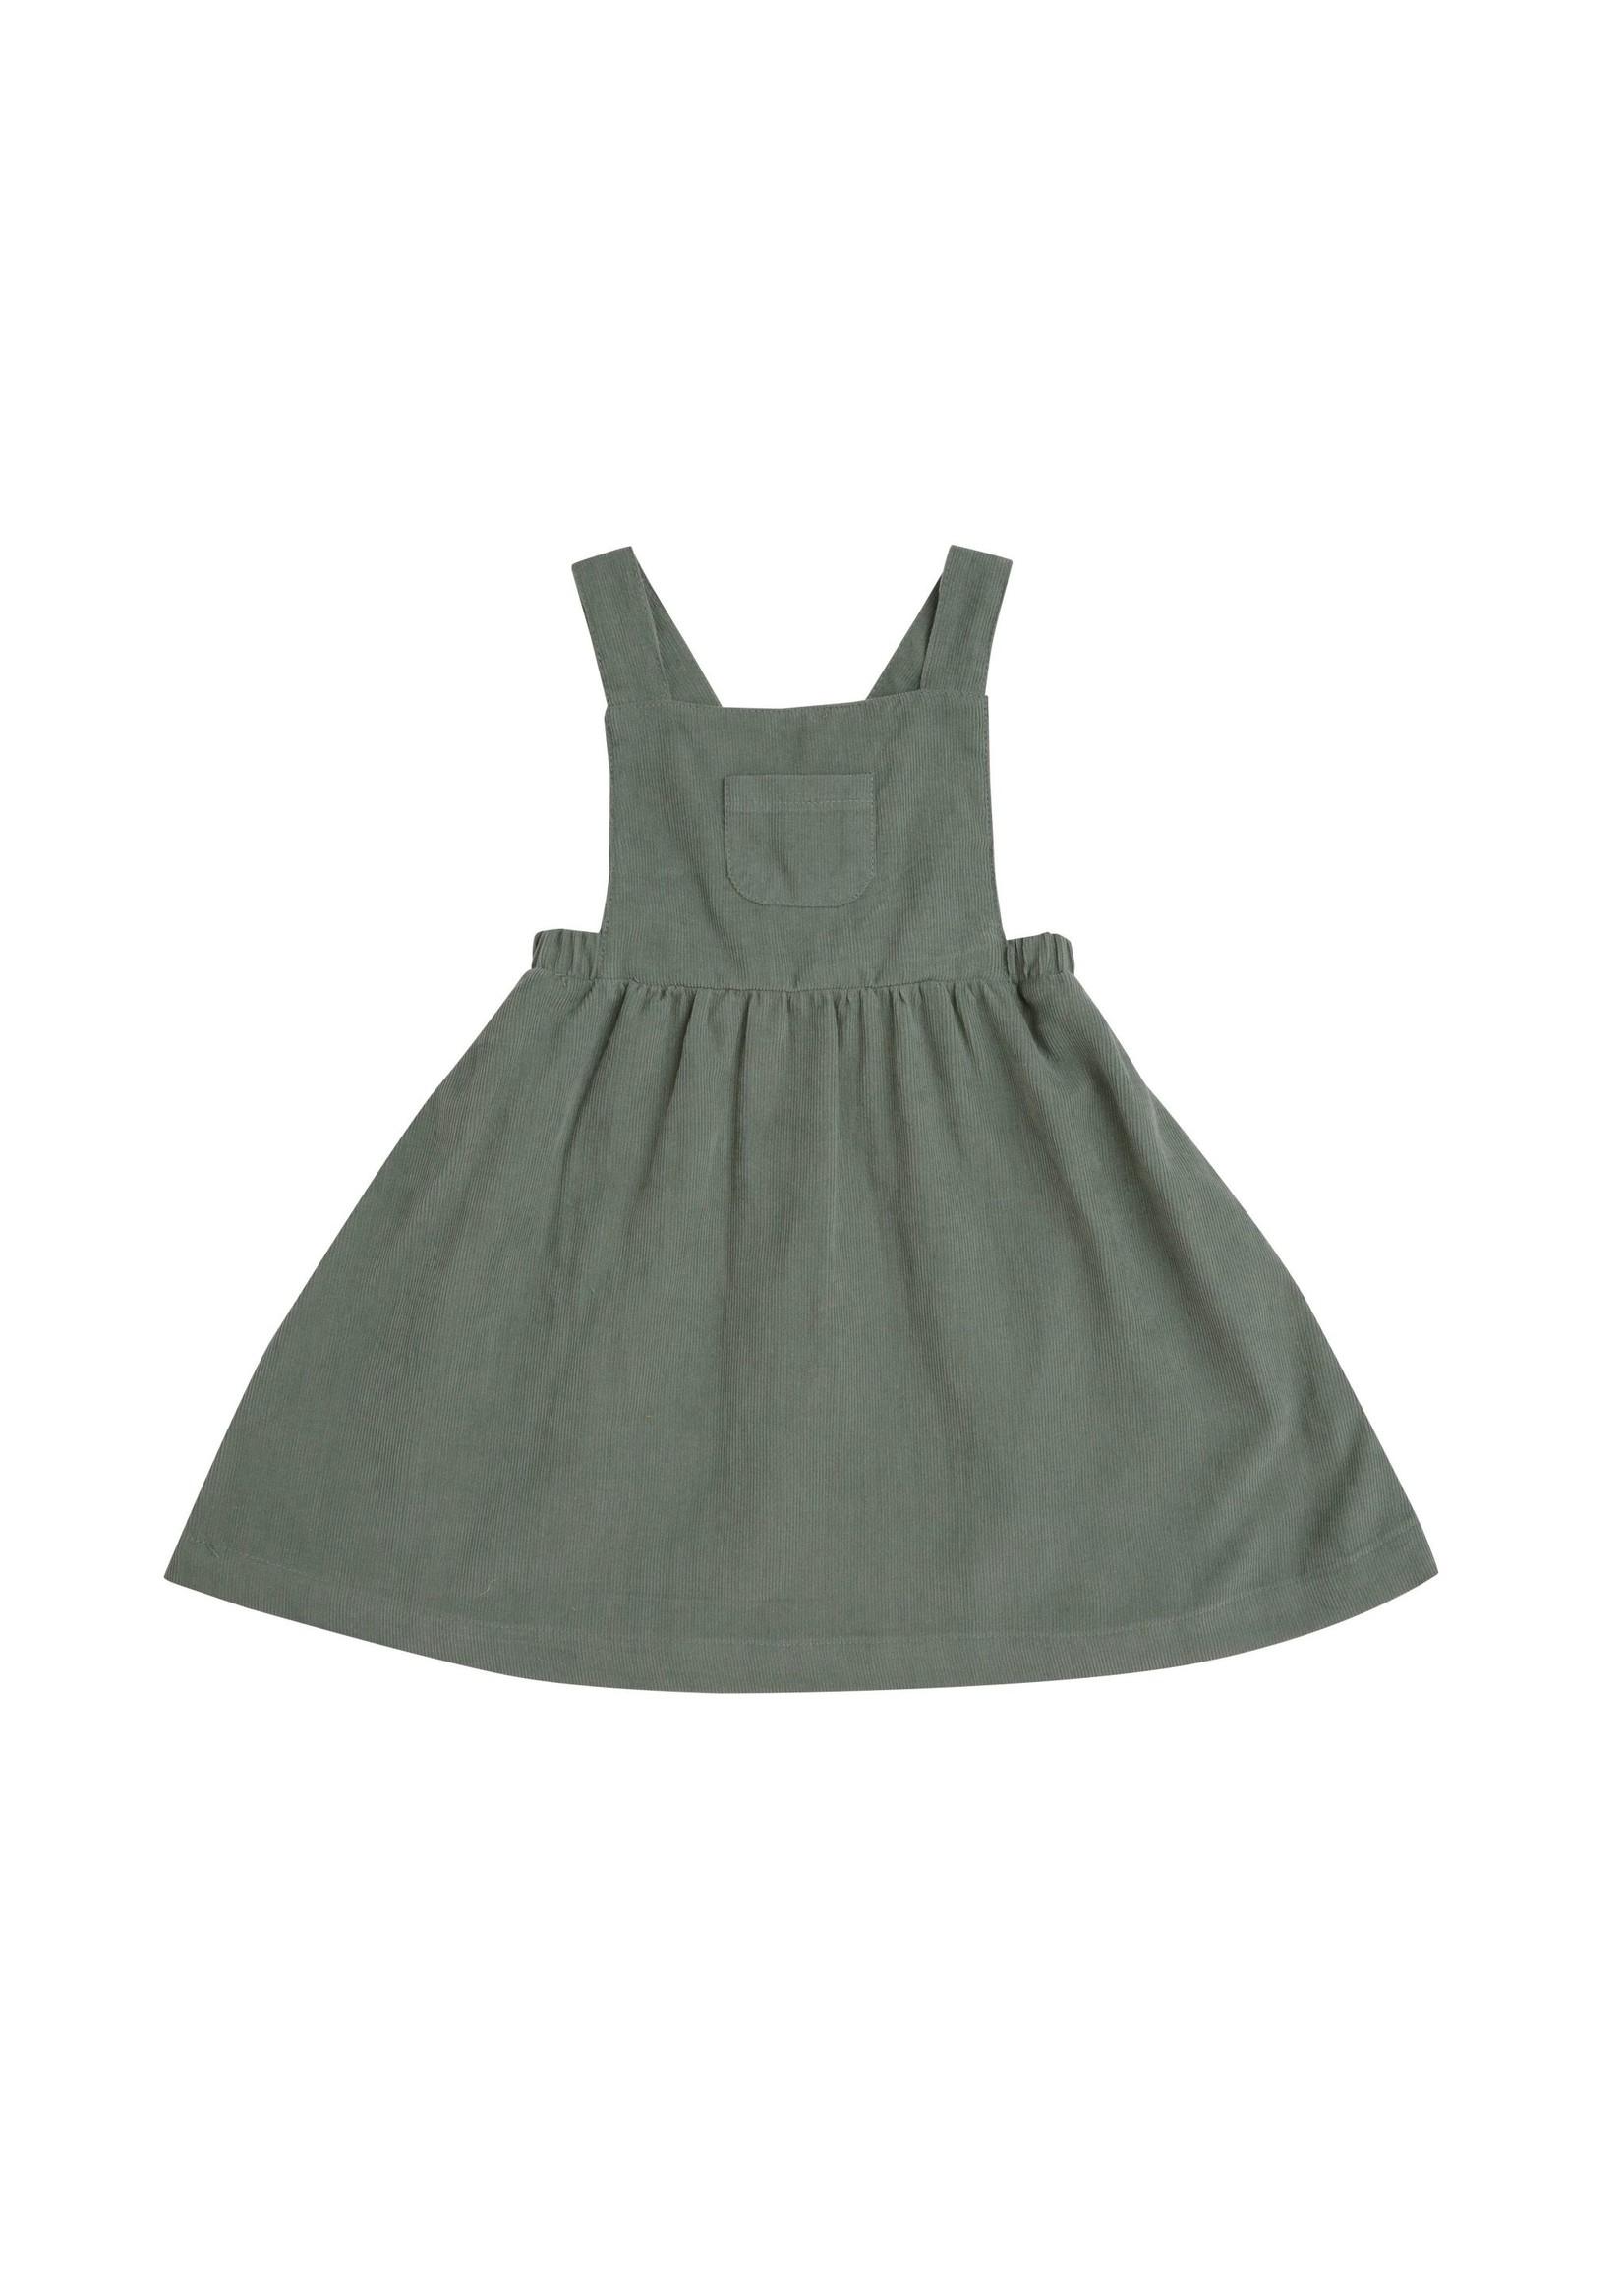 Angel Dear Hedge Green Corduroy Overall Dress